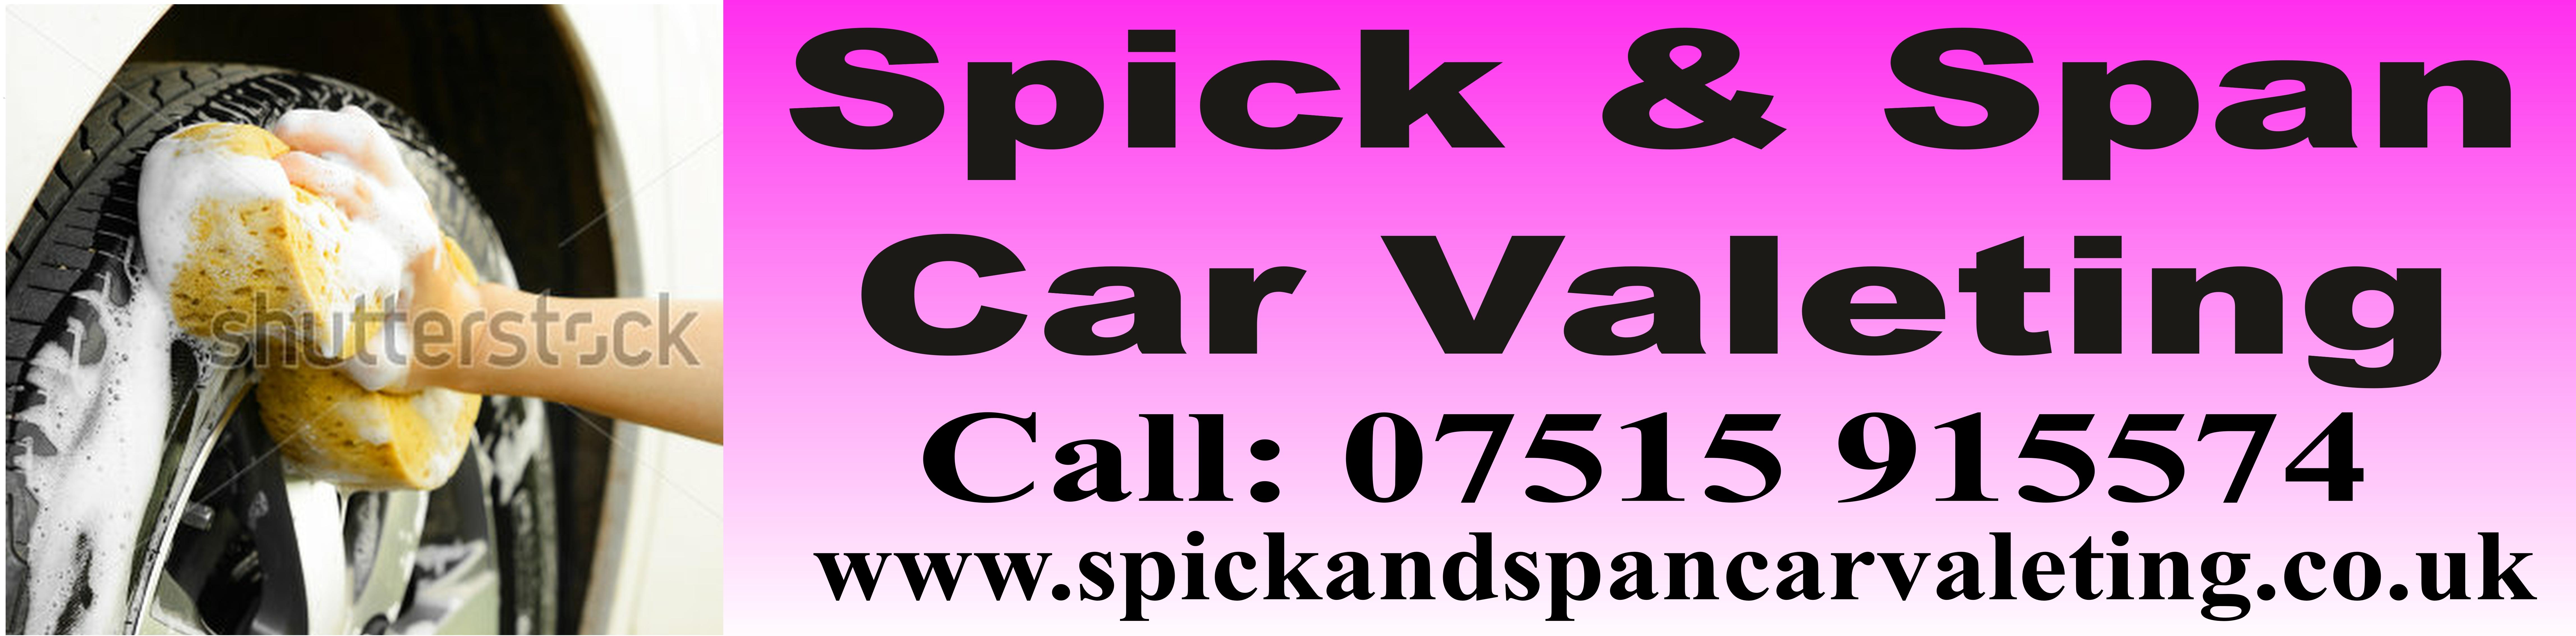 Spick & Span Car Valet